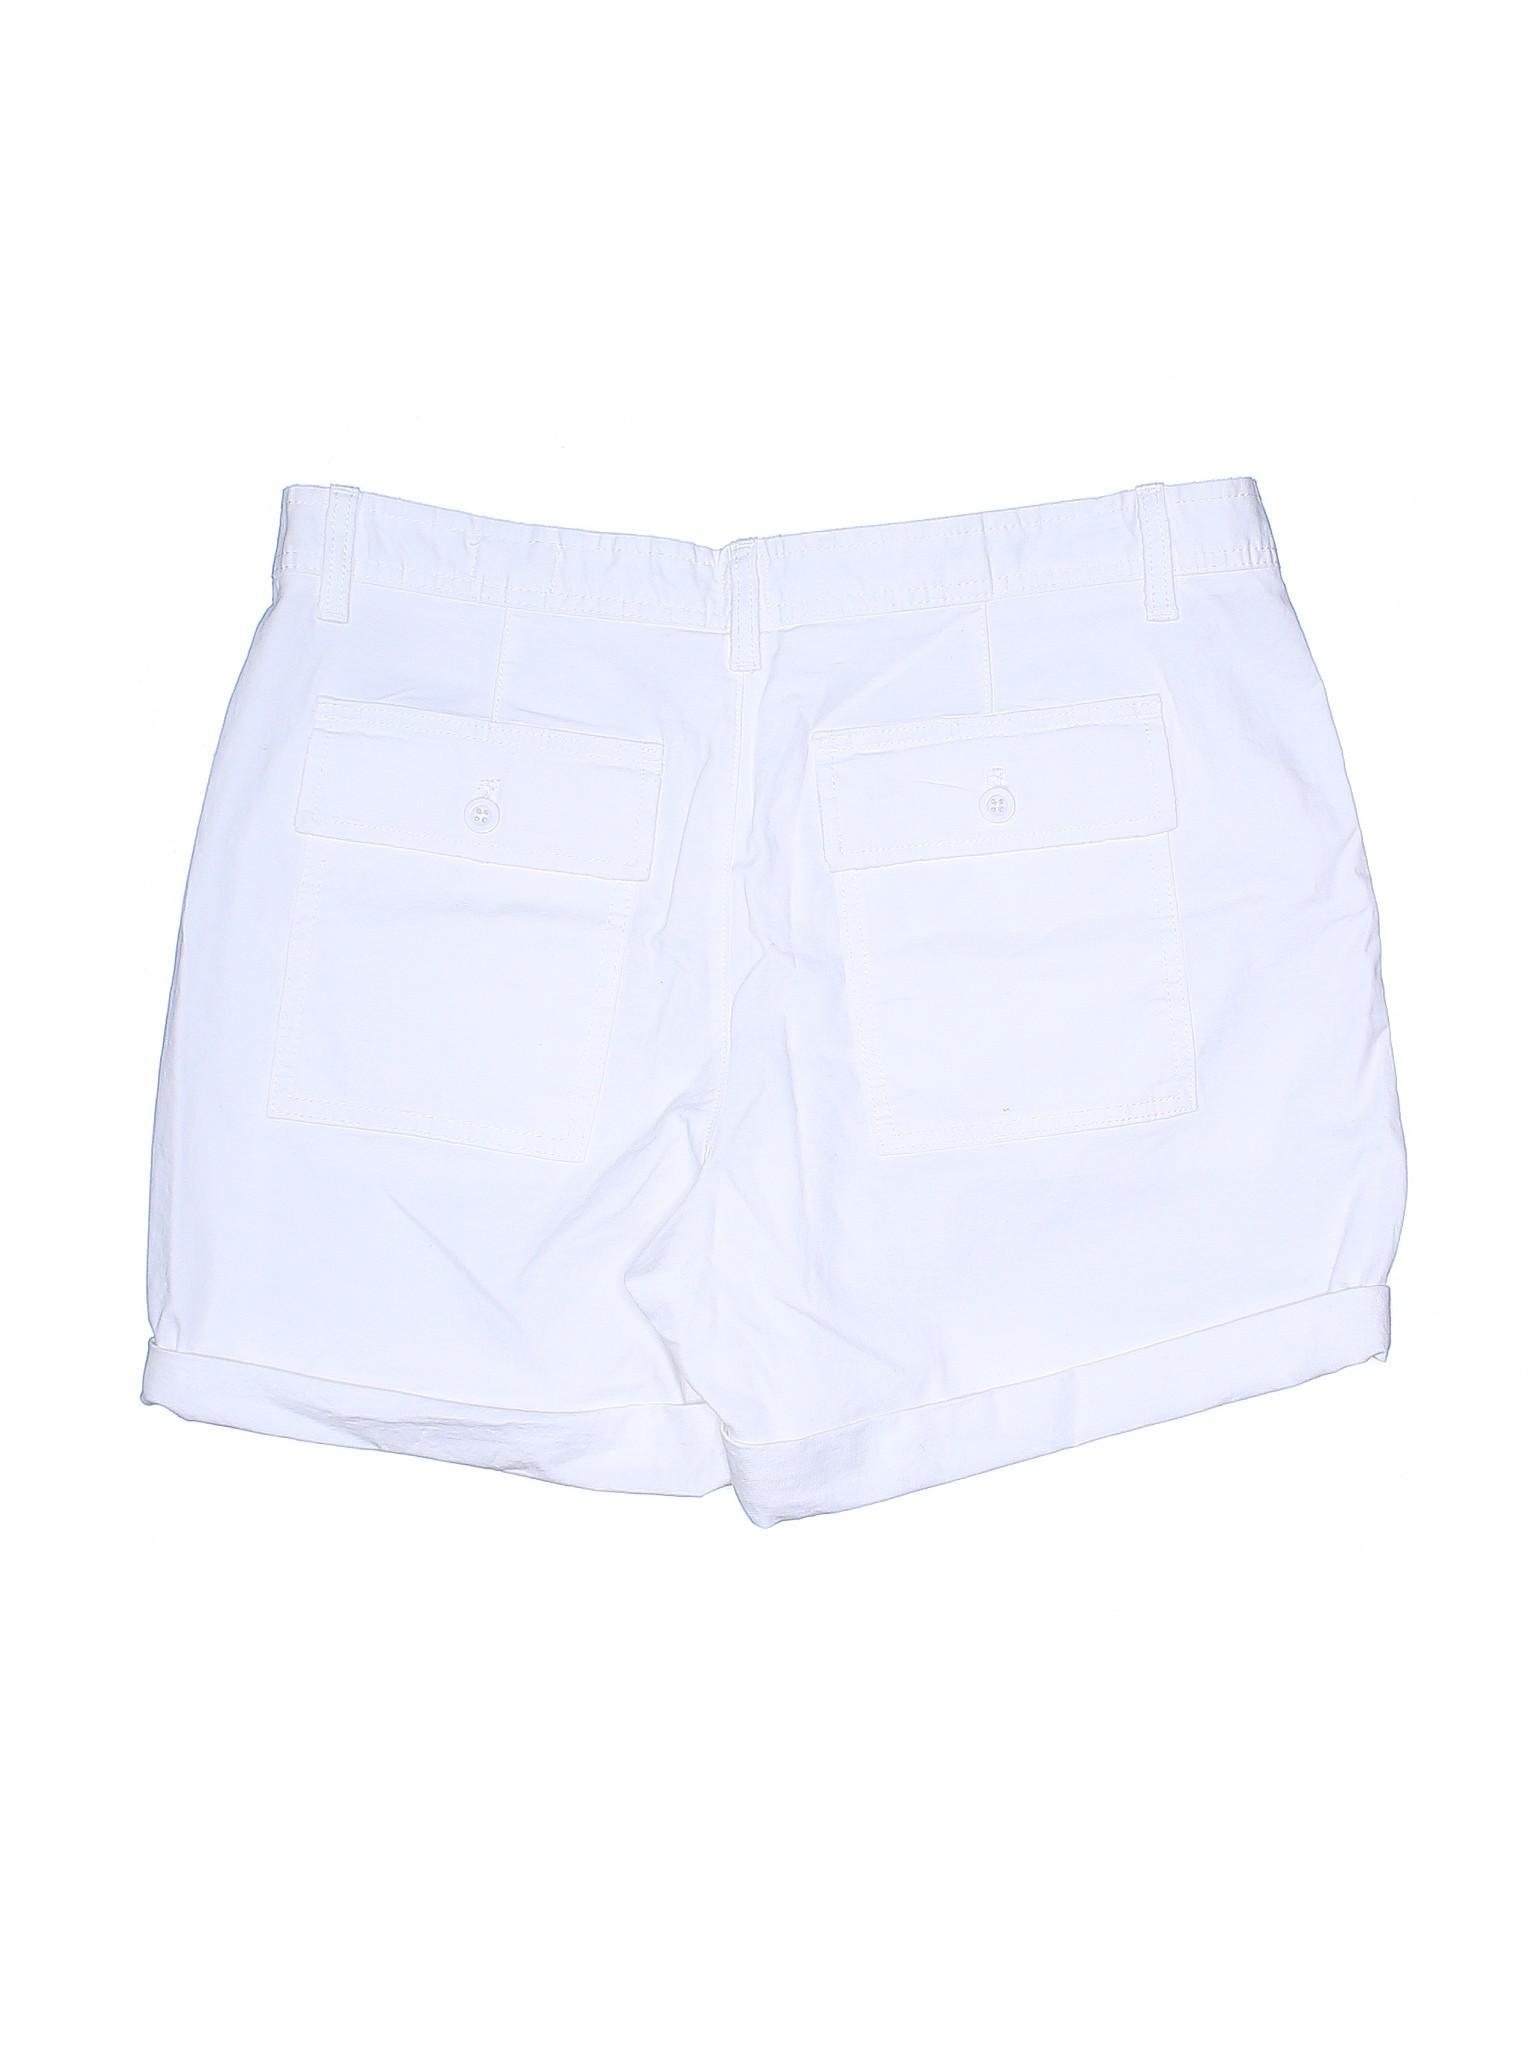 Gap Boutique Khaki Shorts Khaki Gap Boutique BSx5xw47